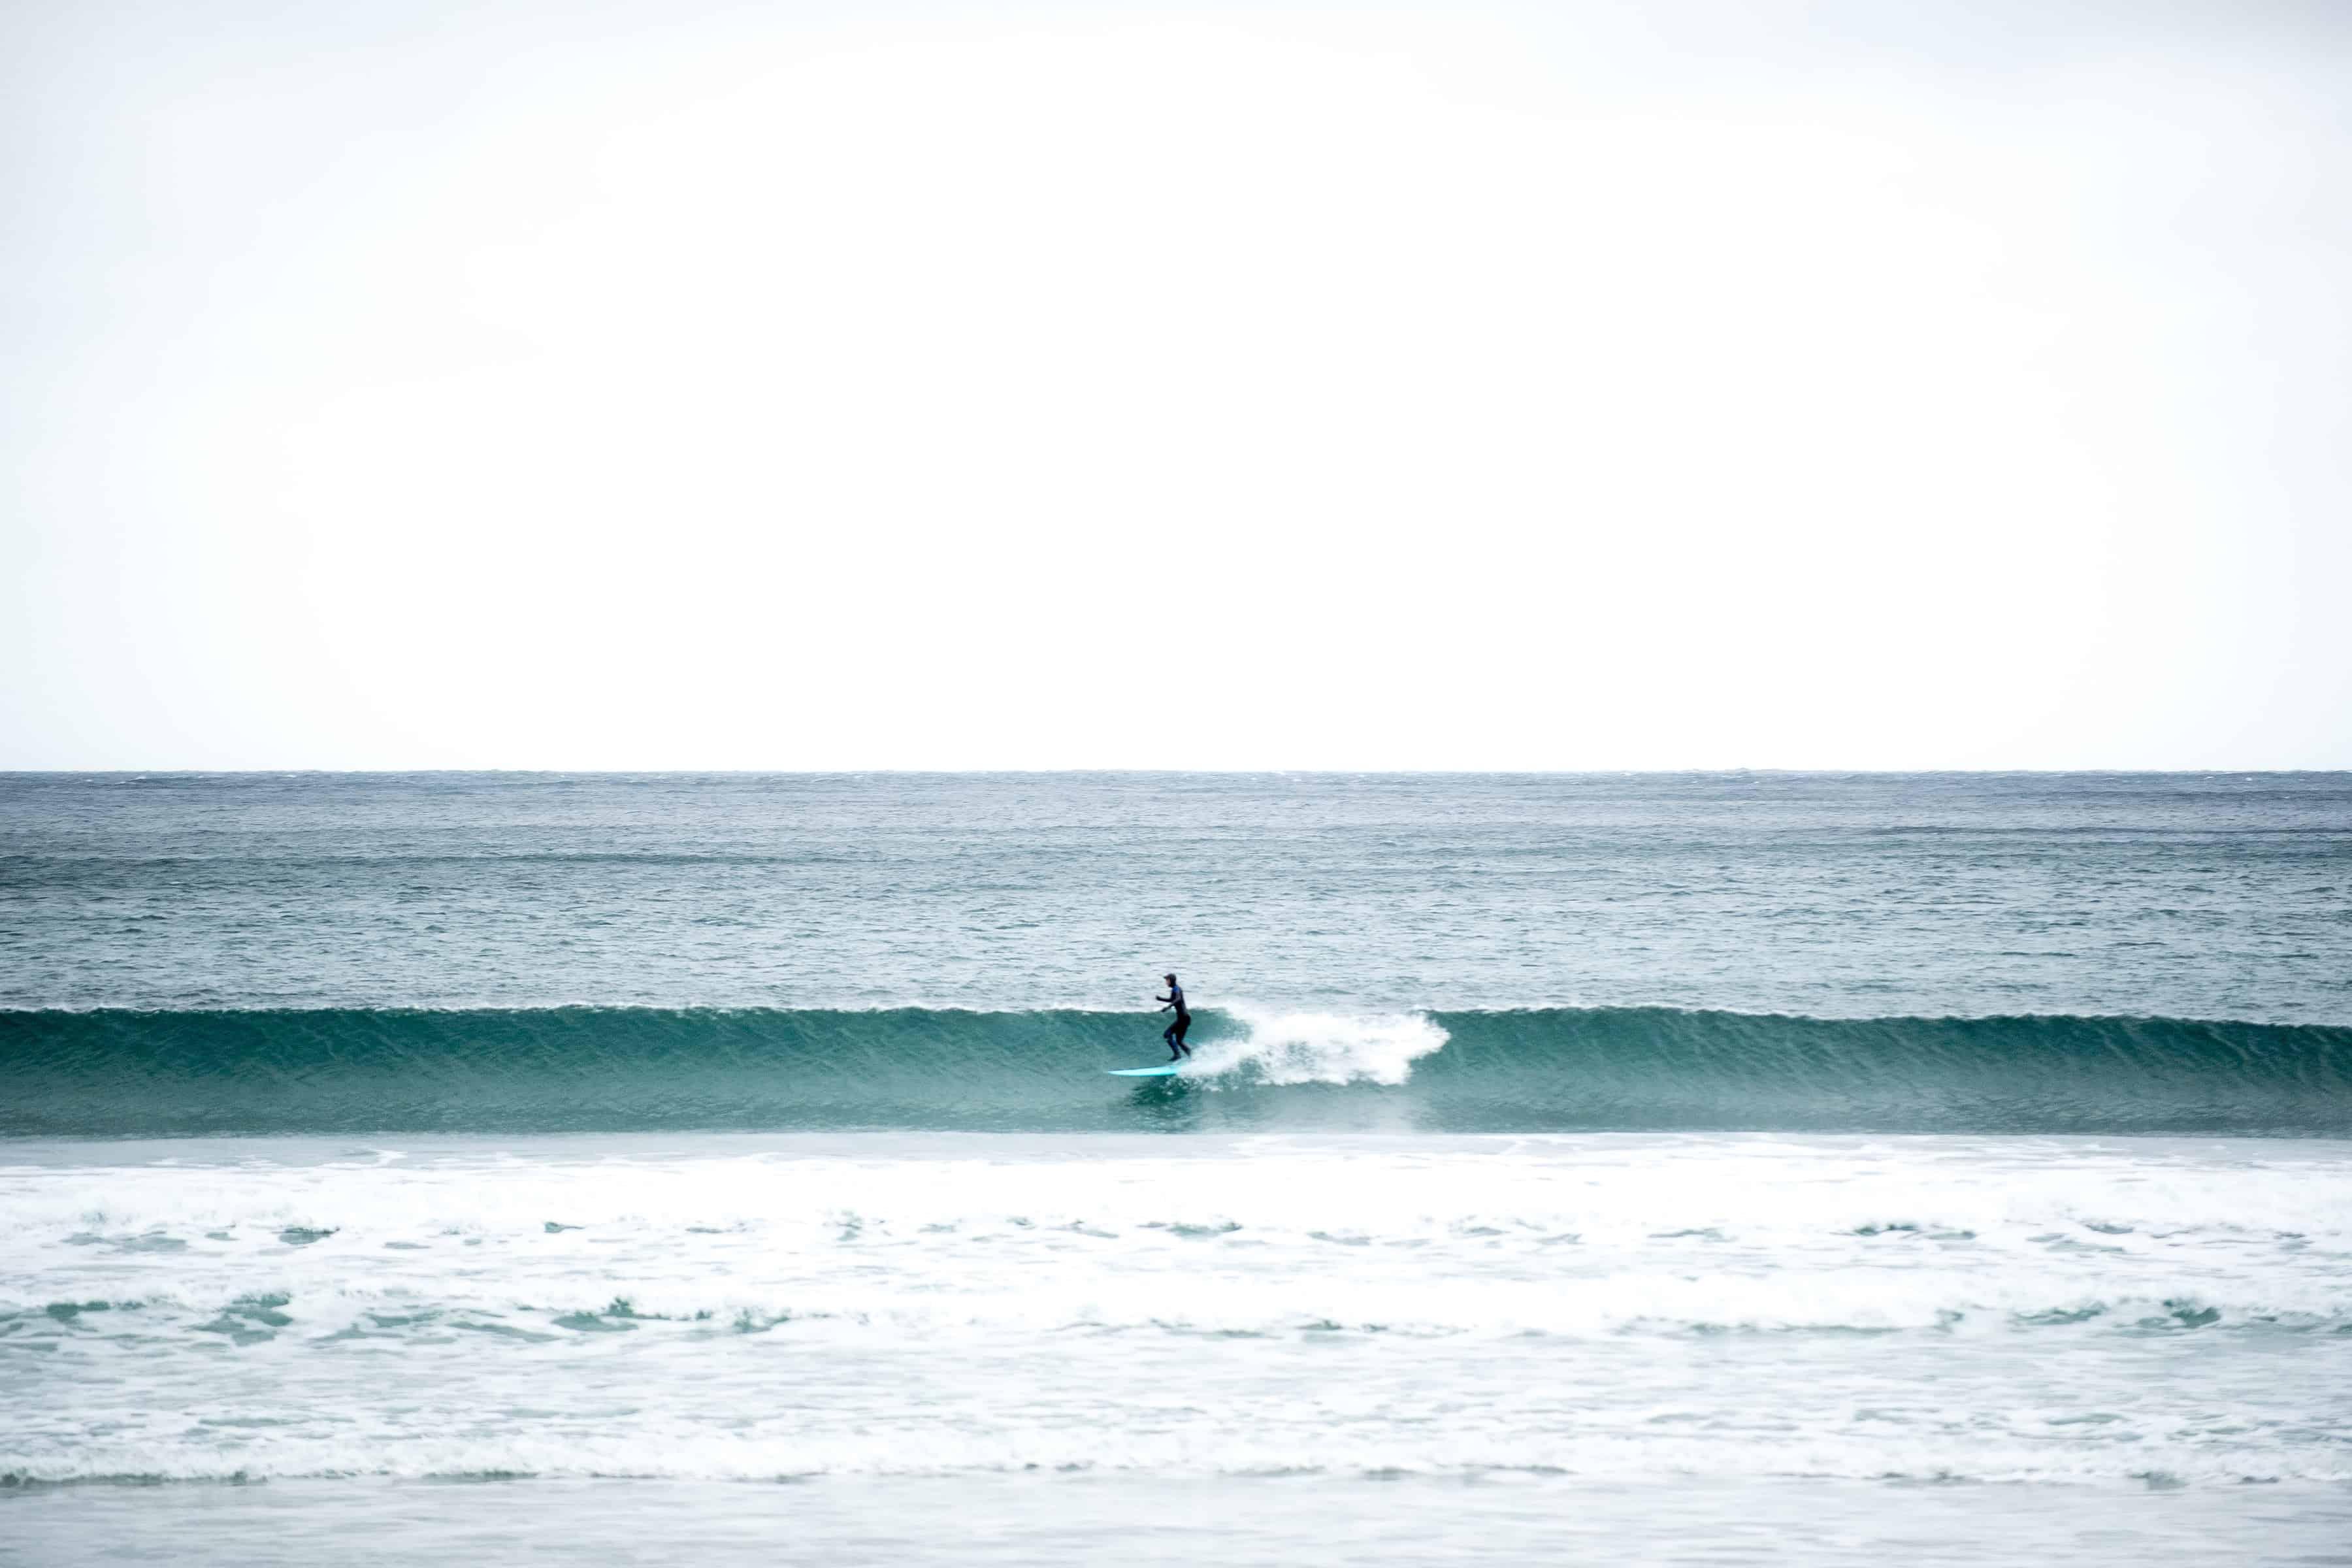 Surfing i Hoddevik